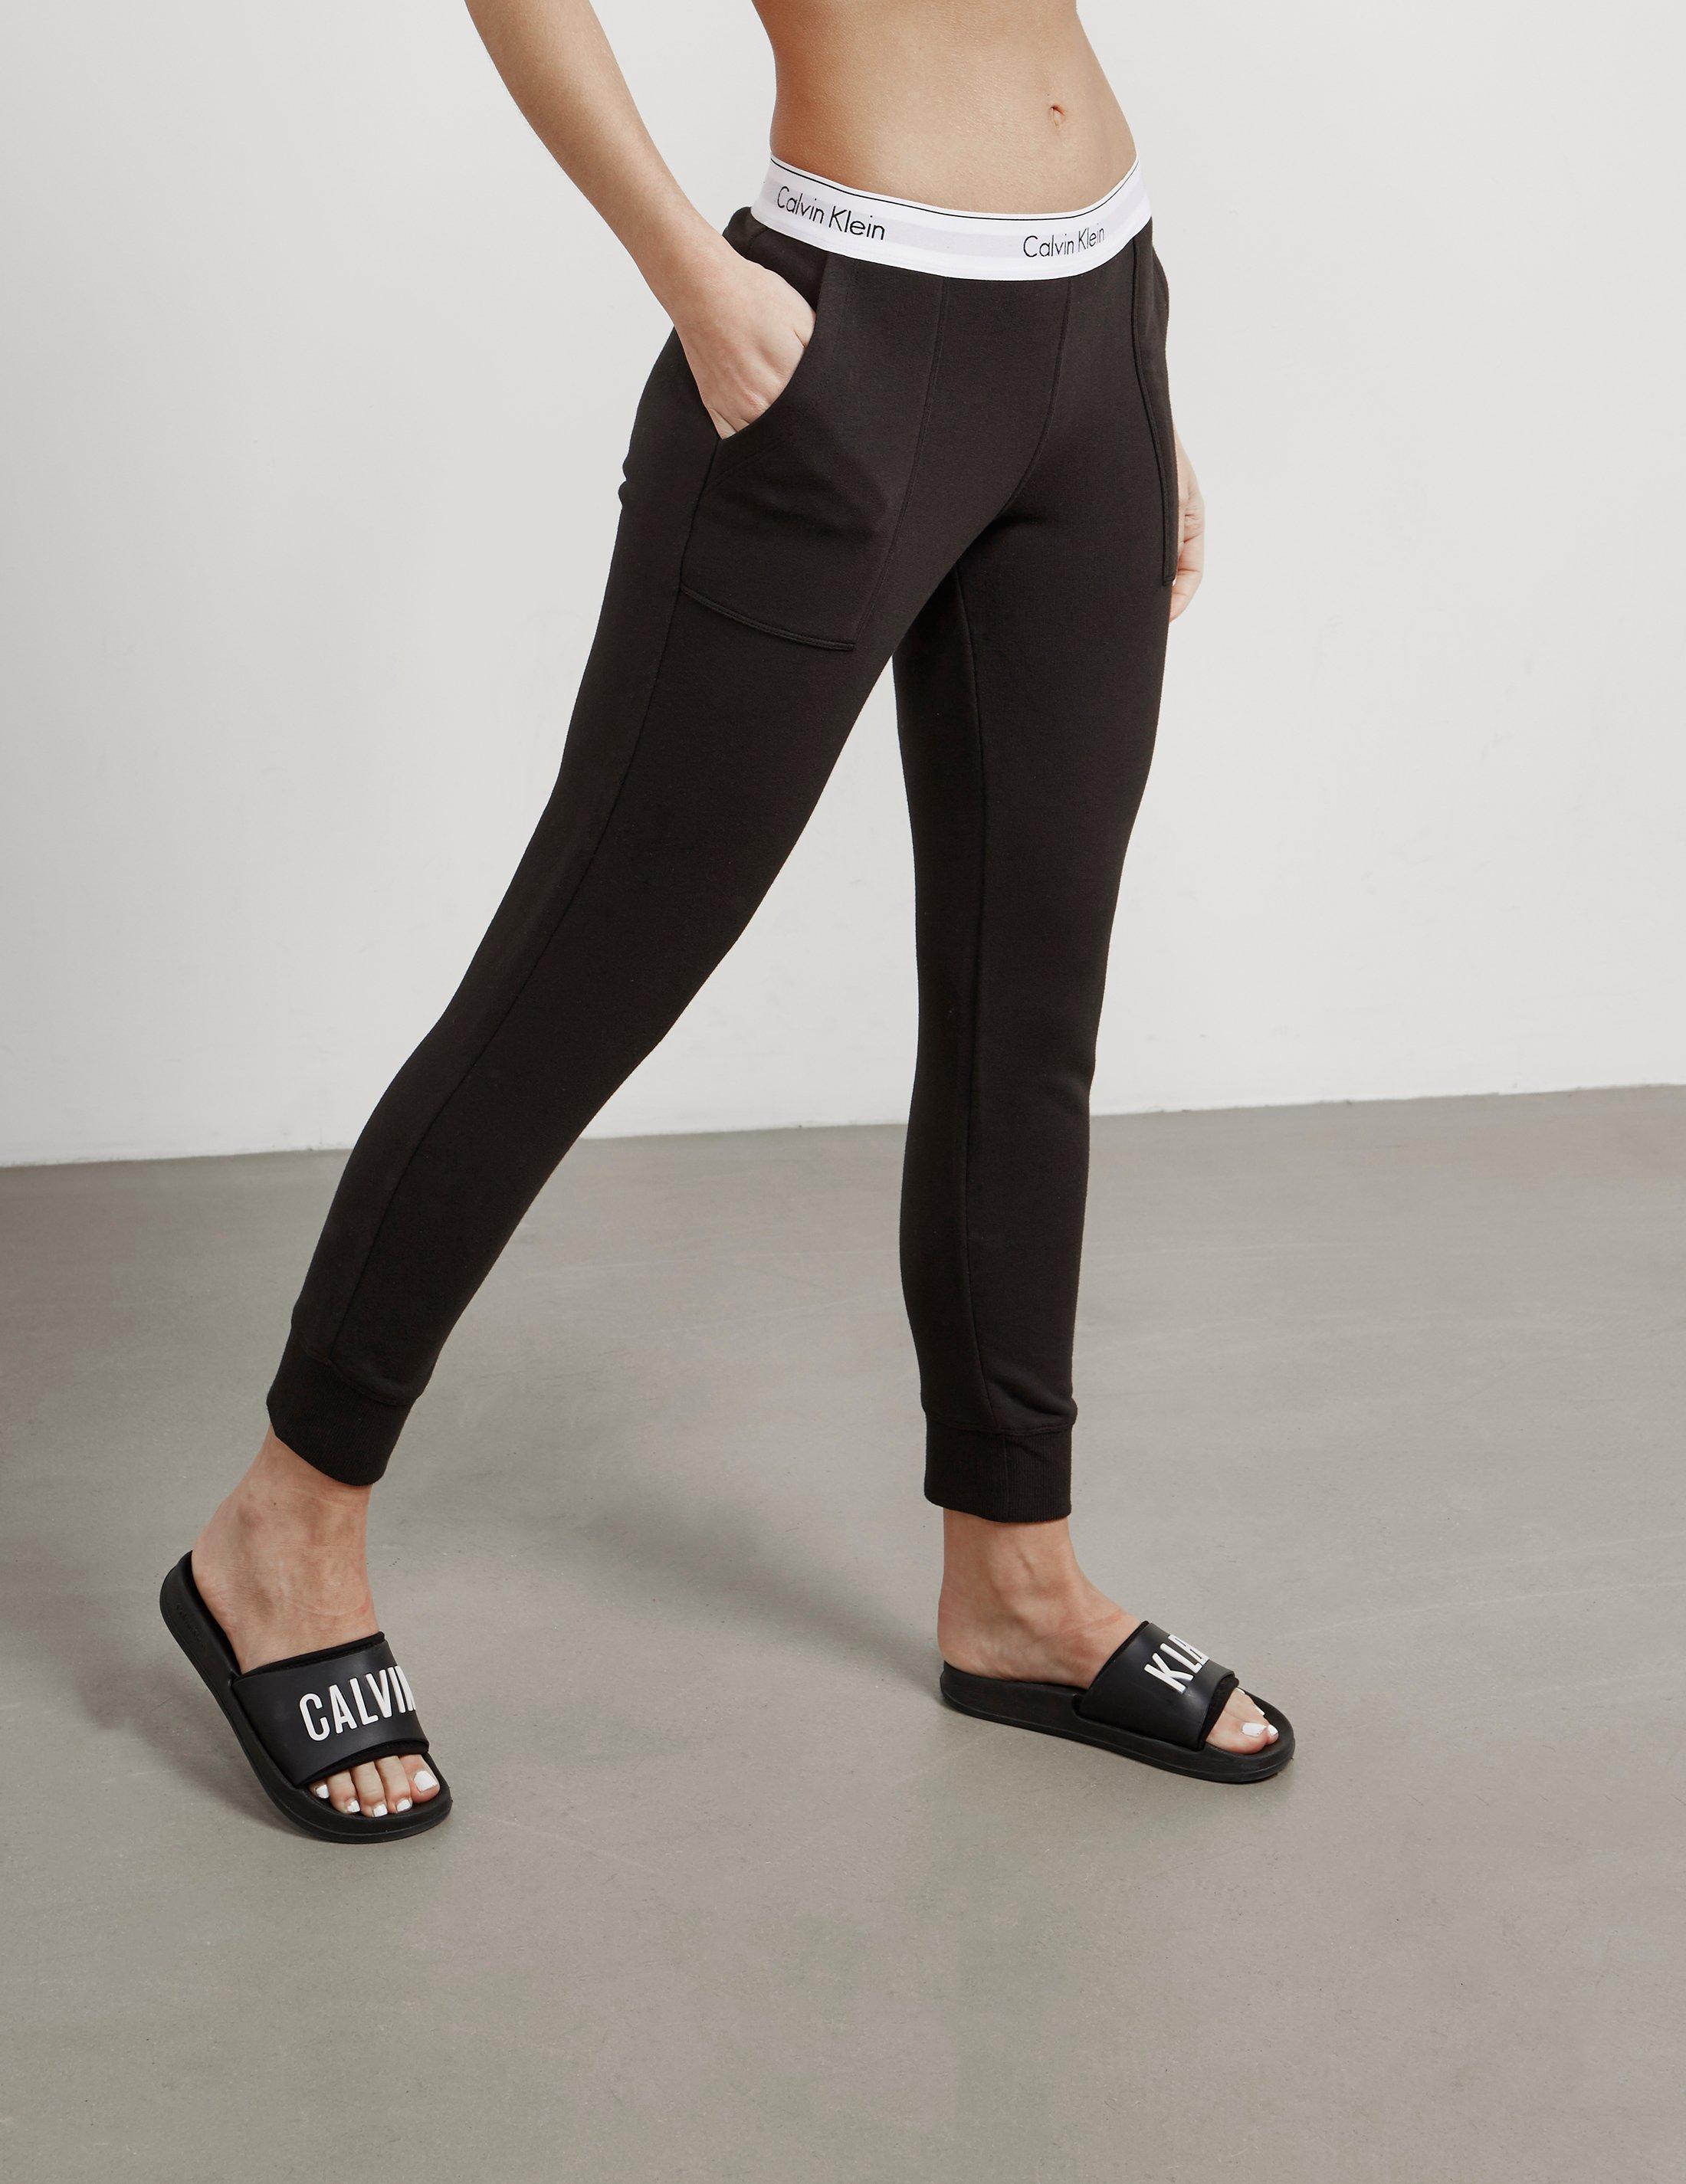 b4a9808ac1 Lyst - Calvin Klein Womens Fleece Pants Black in Black - Save ...